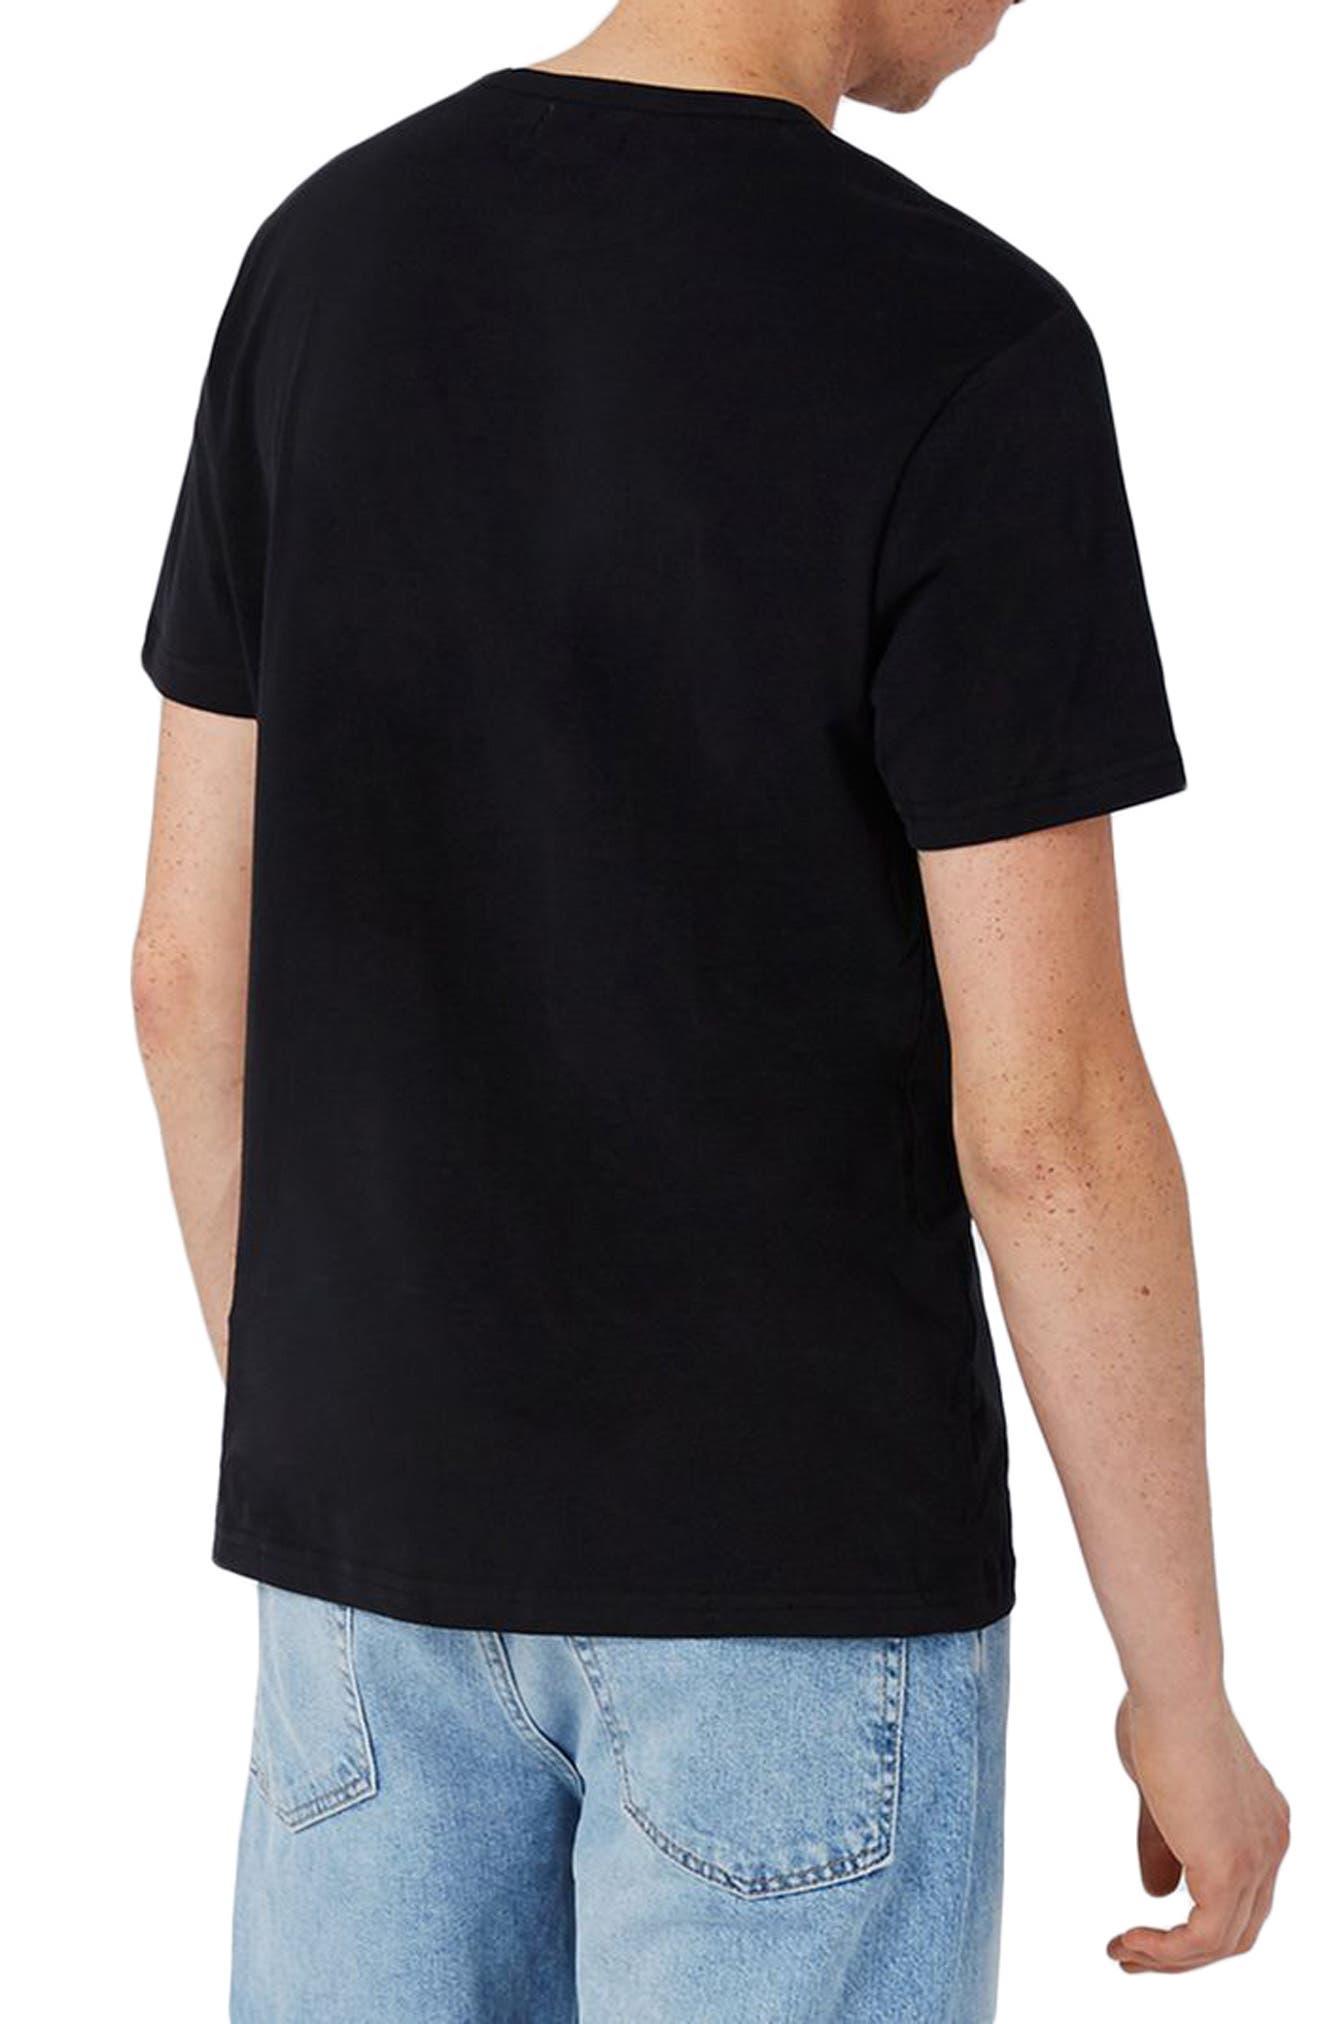 Not Me Embroidery T-Shirt,                             Alternate thumbnail 2, color,                             Black